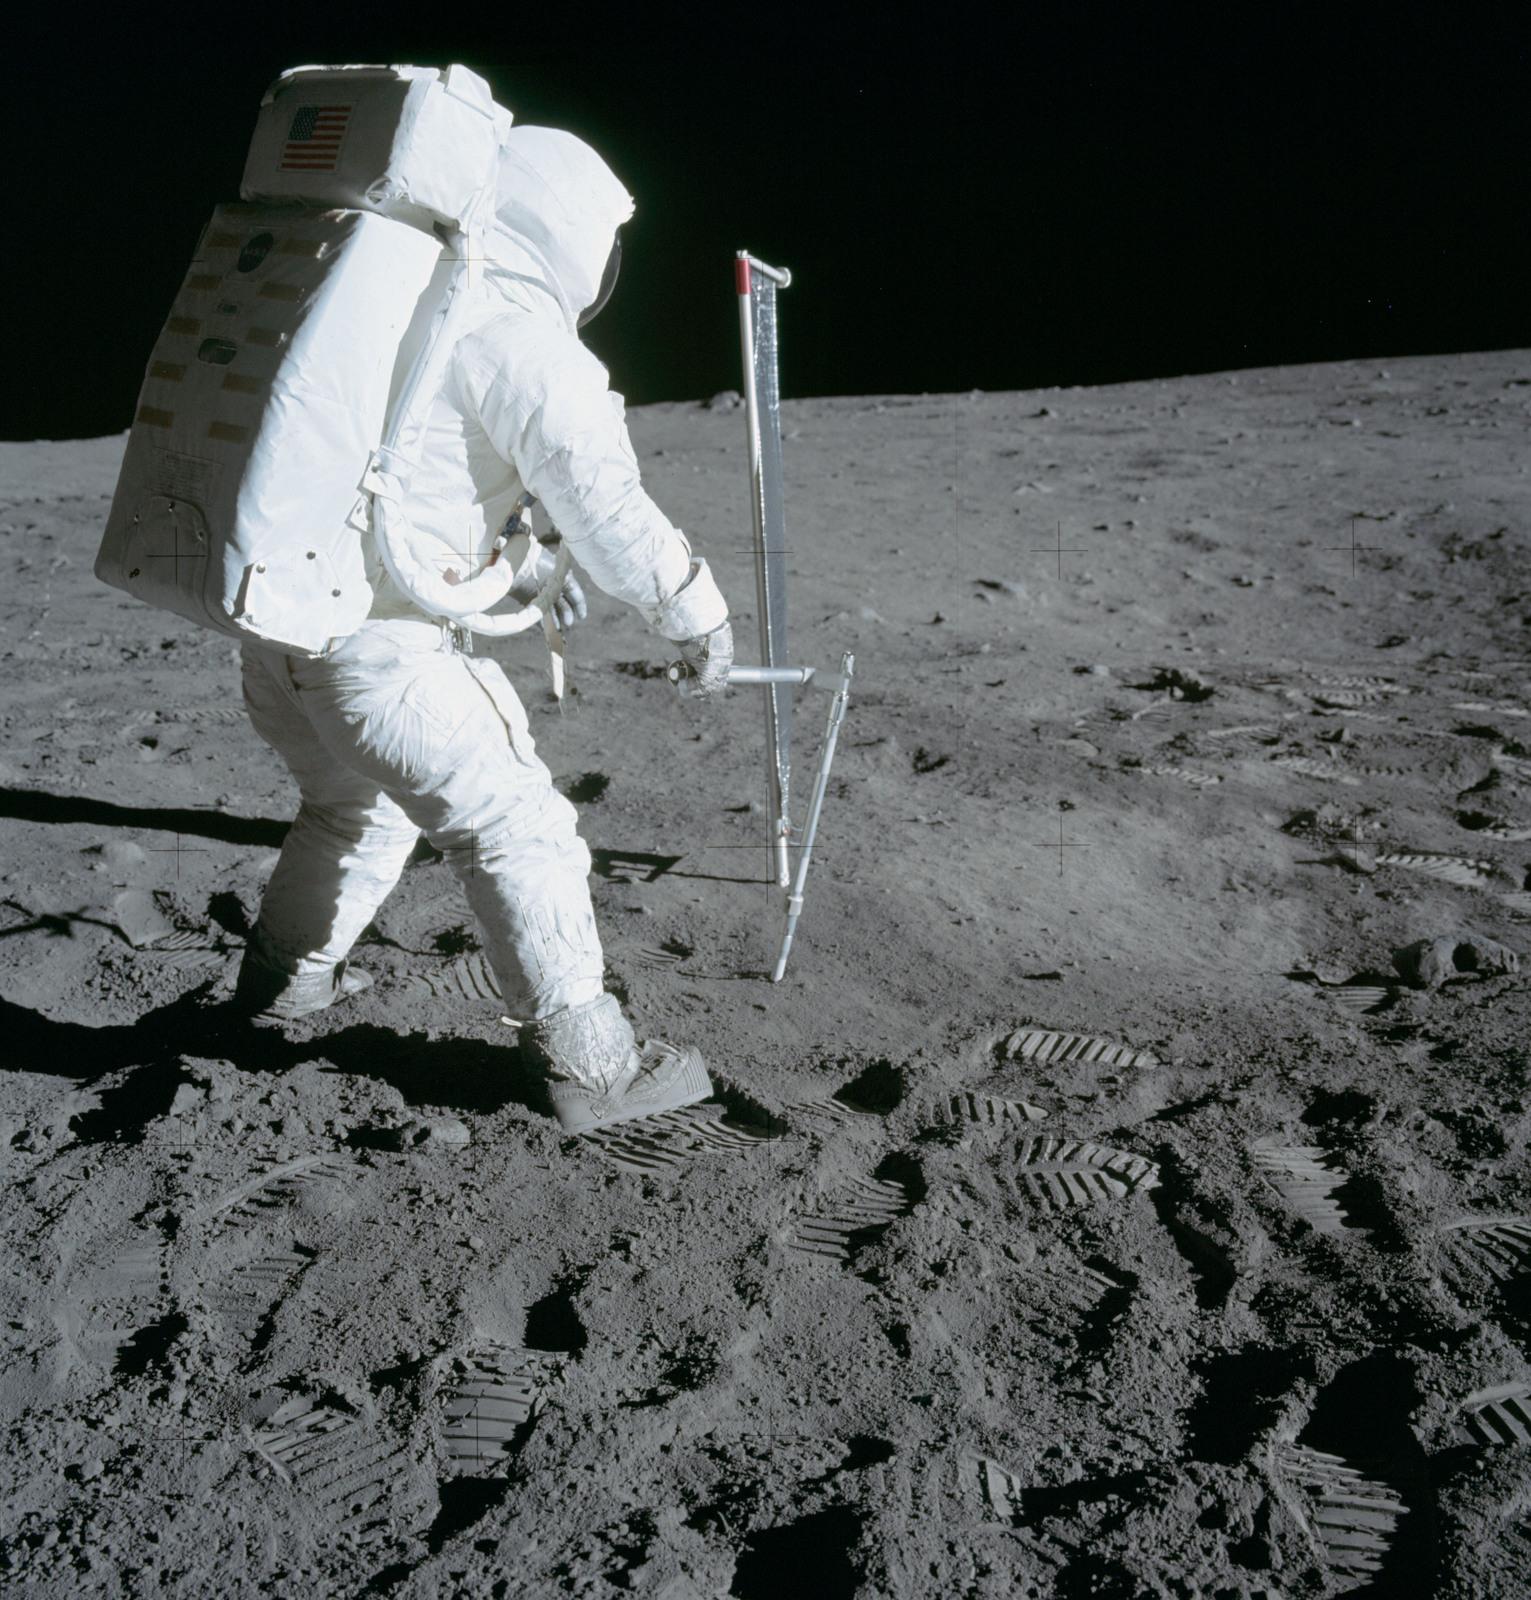 AS11-40-5964 - Apollo 11 - Apollo 11 Mission image - Astronaut Edwin Aldrin takes a core-tube sample